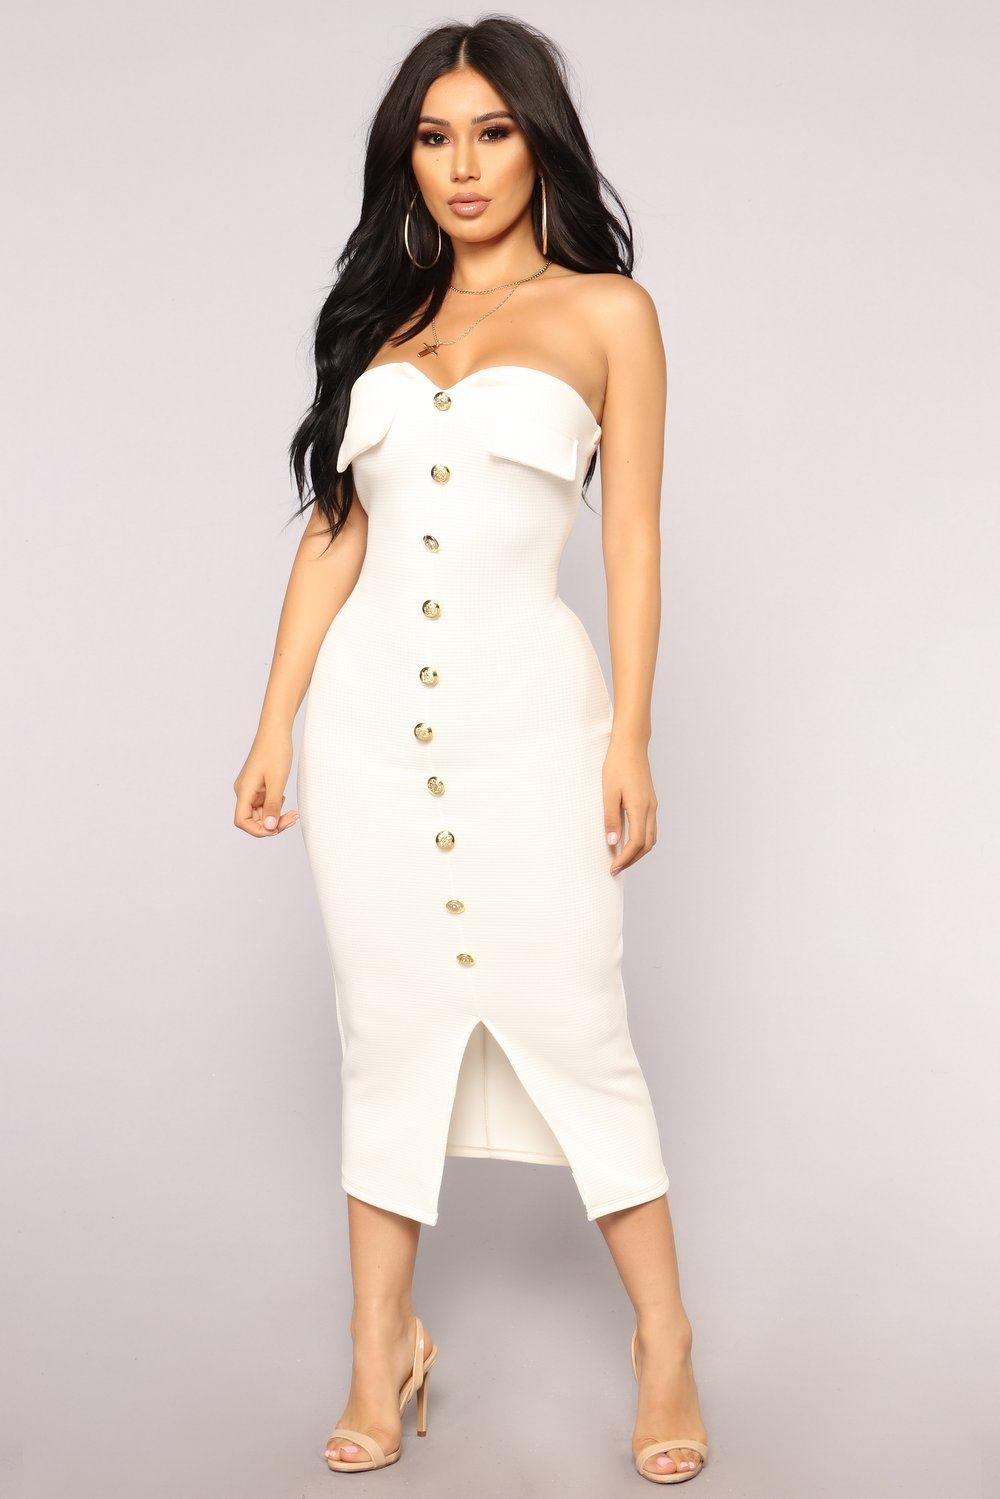 Key To My Heart Tube Dress White Tube dress, Fashion